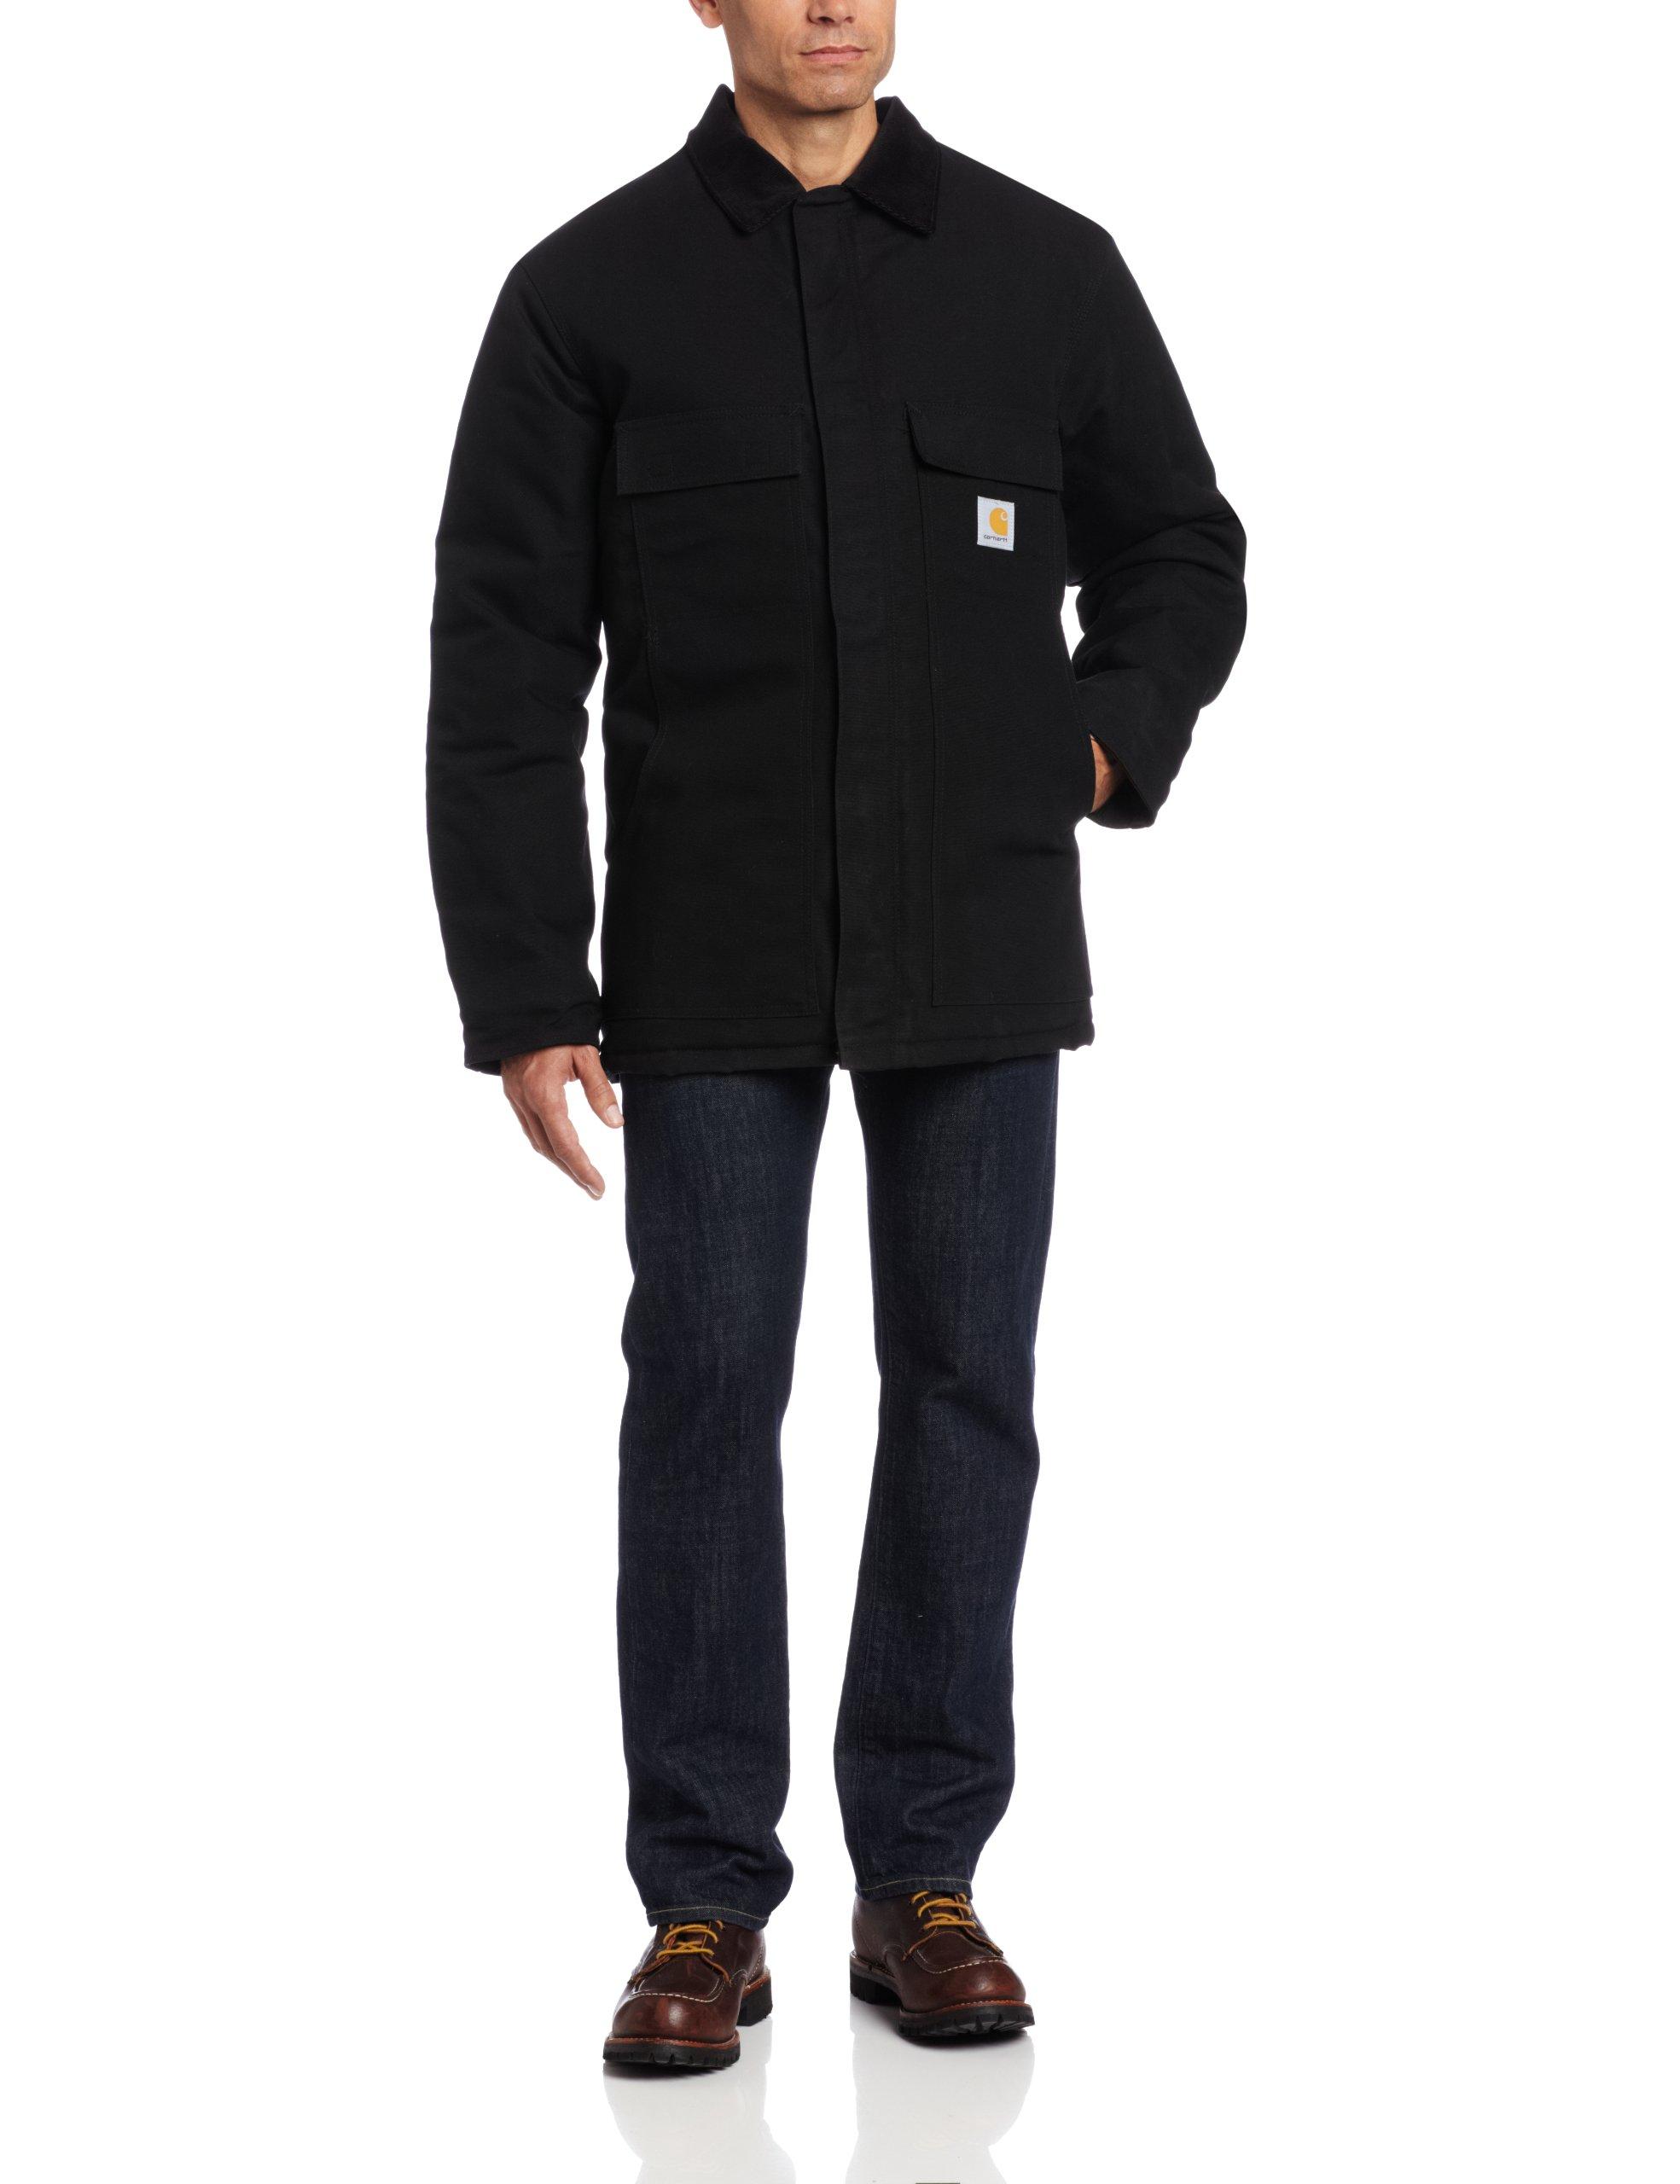 Carhartt Men's Big & Tall Arctic Quilt Lined Duck Traditional Coat C003,Black,XX-Large Tall